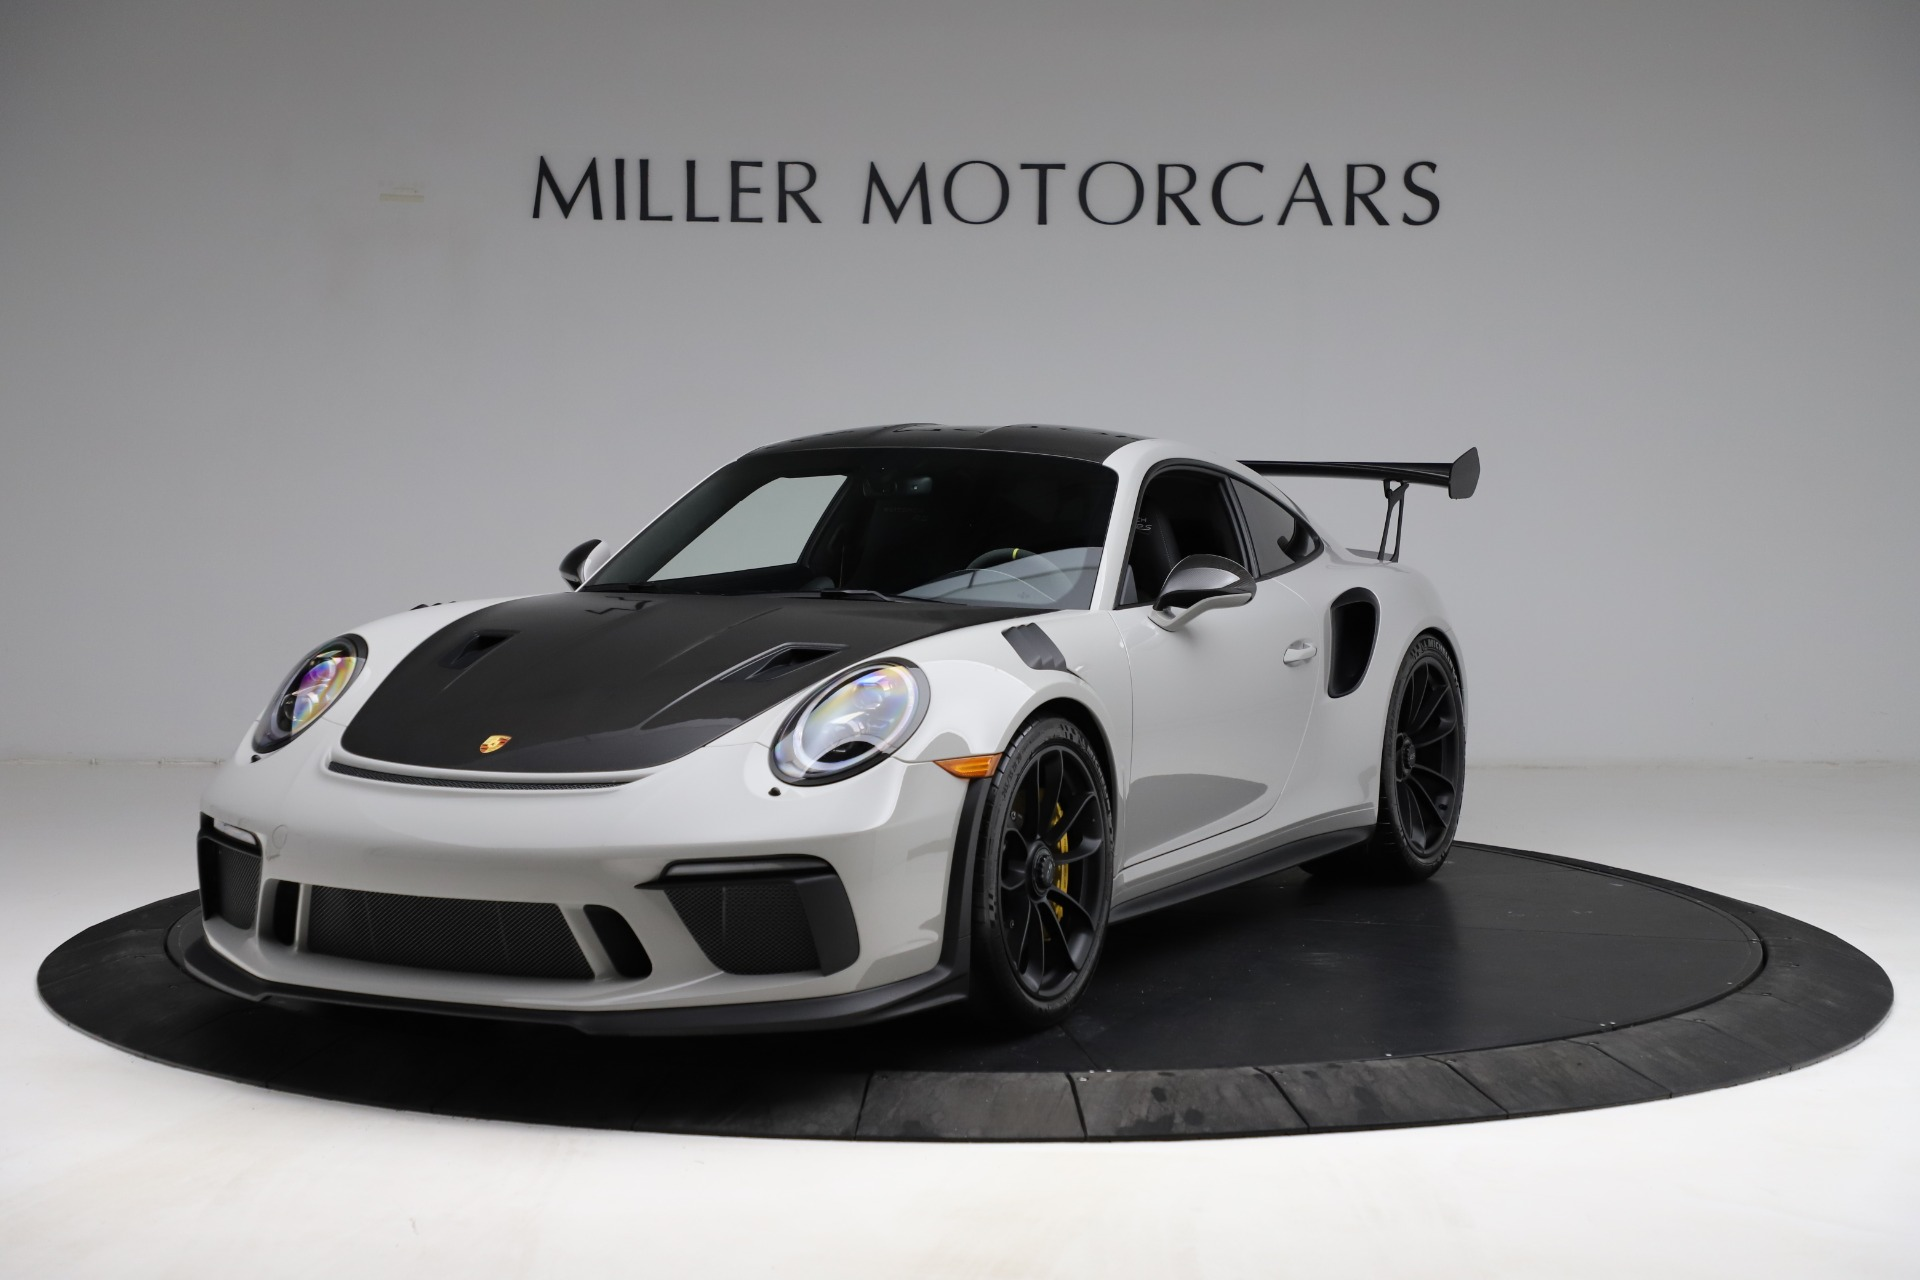 Used 2019 Porsche 911 GT3 RS for sale $249,900 at Alfa Romeo of Westport in Westport CT 06880 1